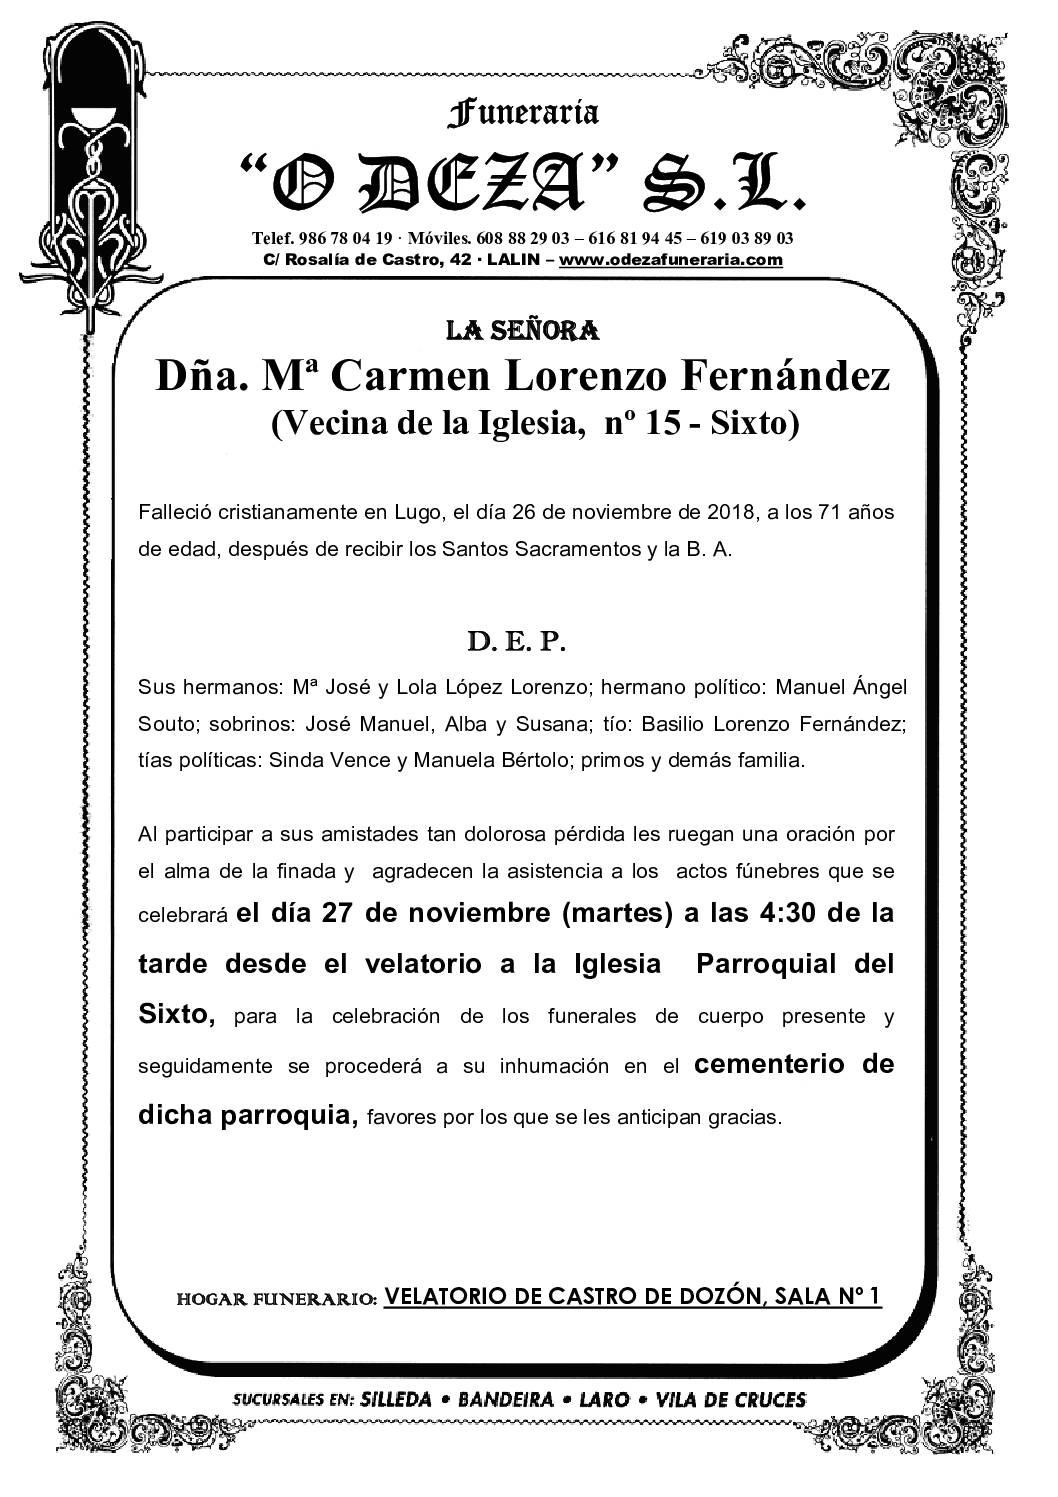 DÑA. Mª CARMEN LORENZO FERNÁNDEZ